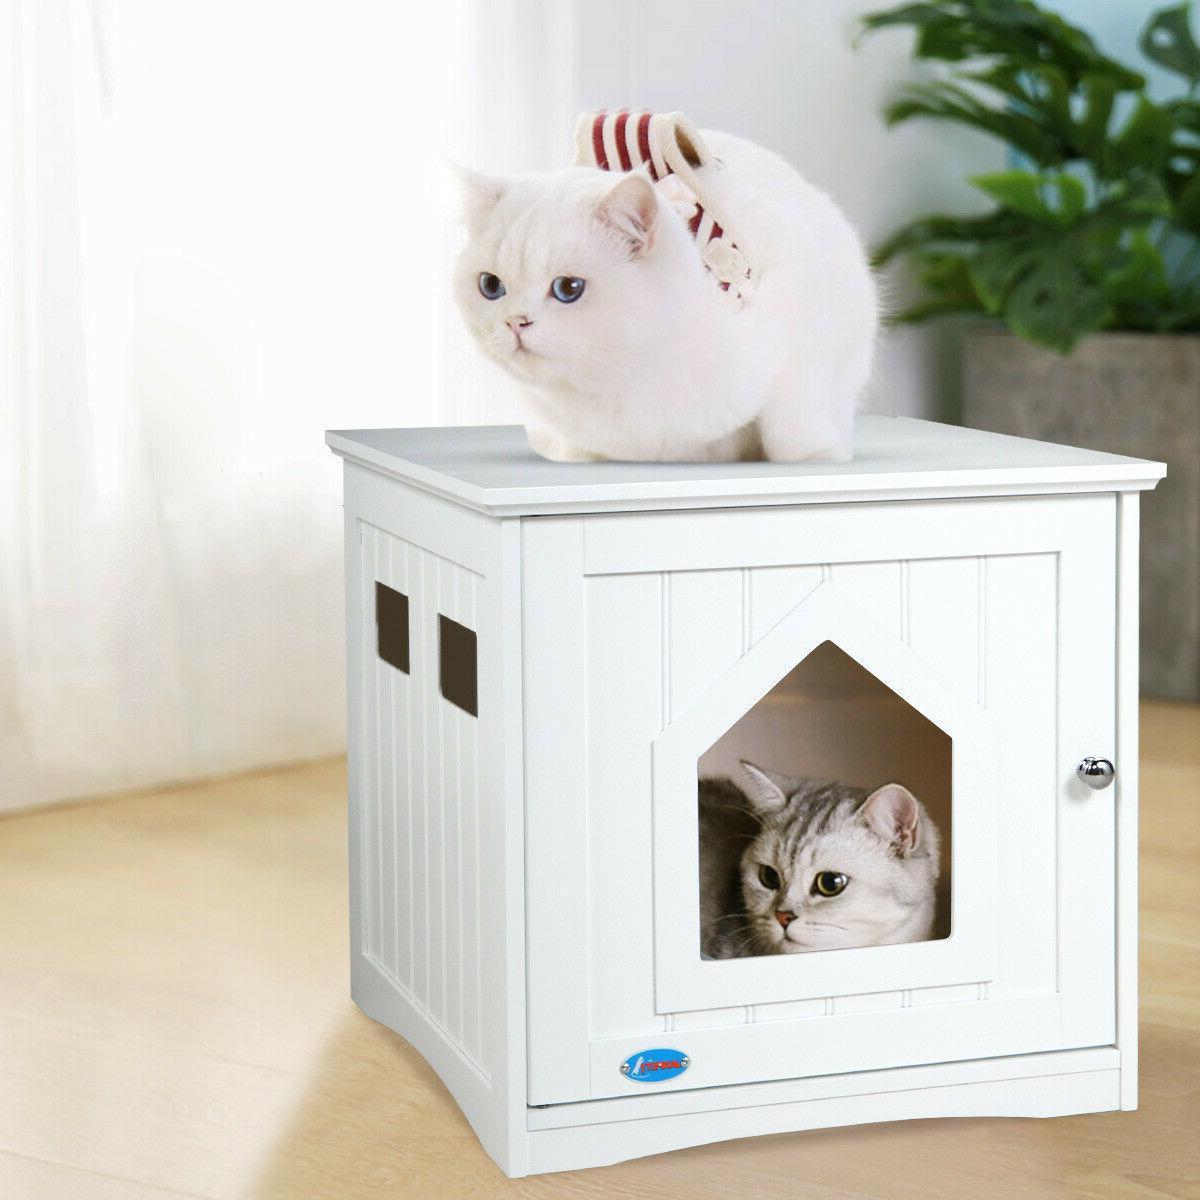 Cat Litter Box Wooden Cabinet Enclosure Hidden Toilet House